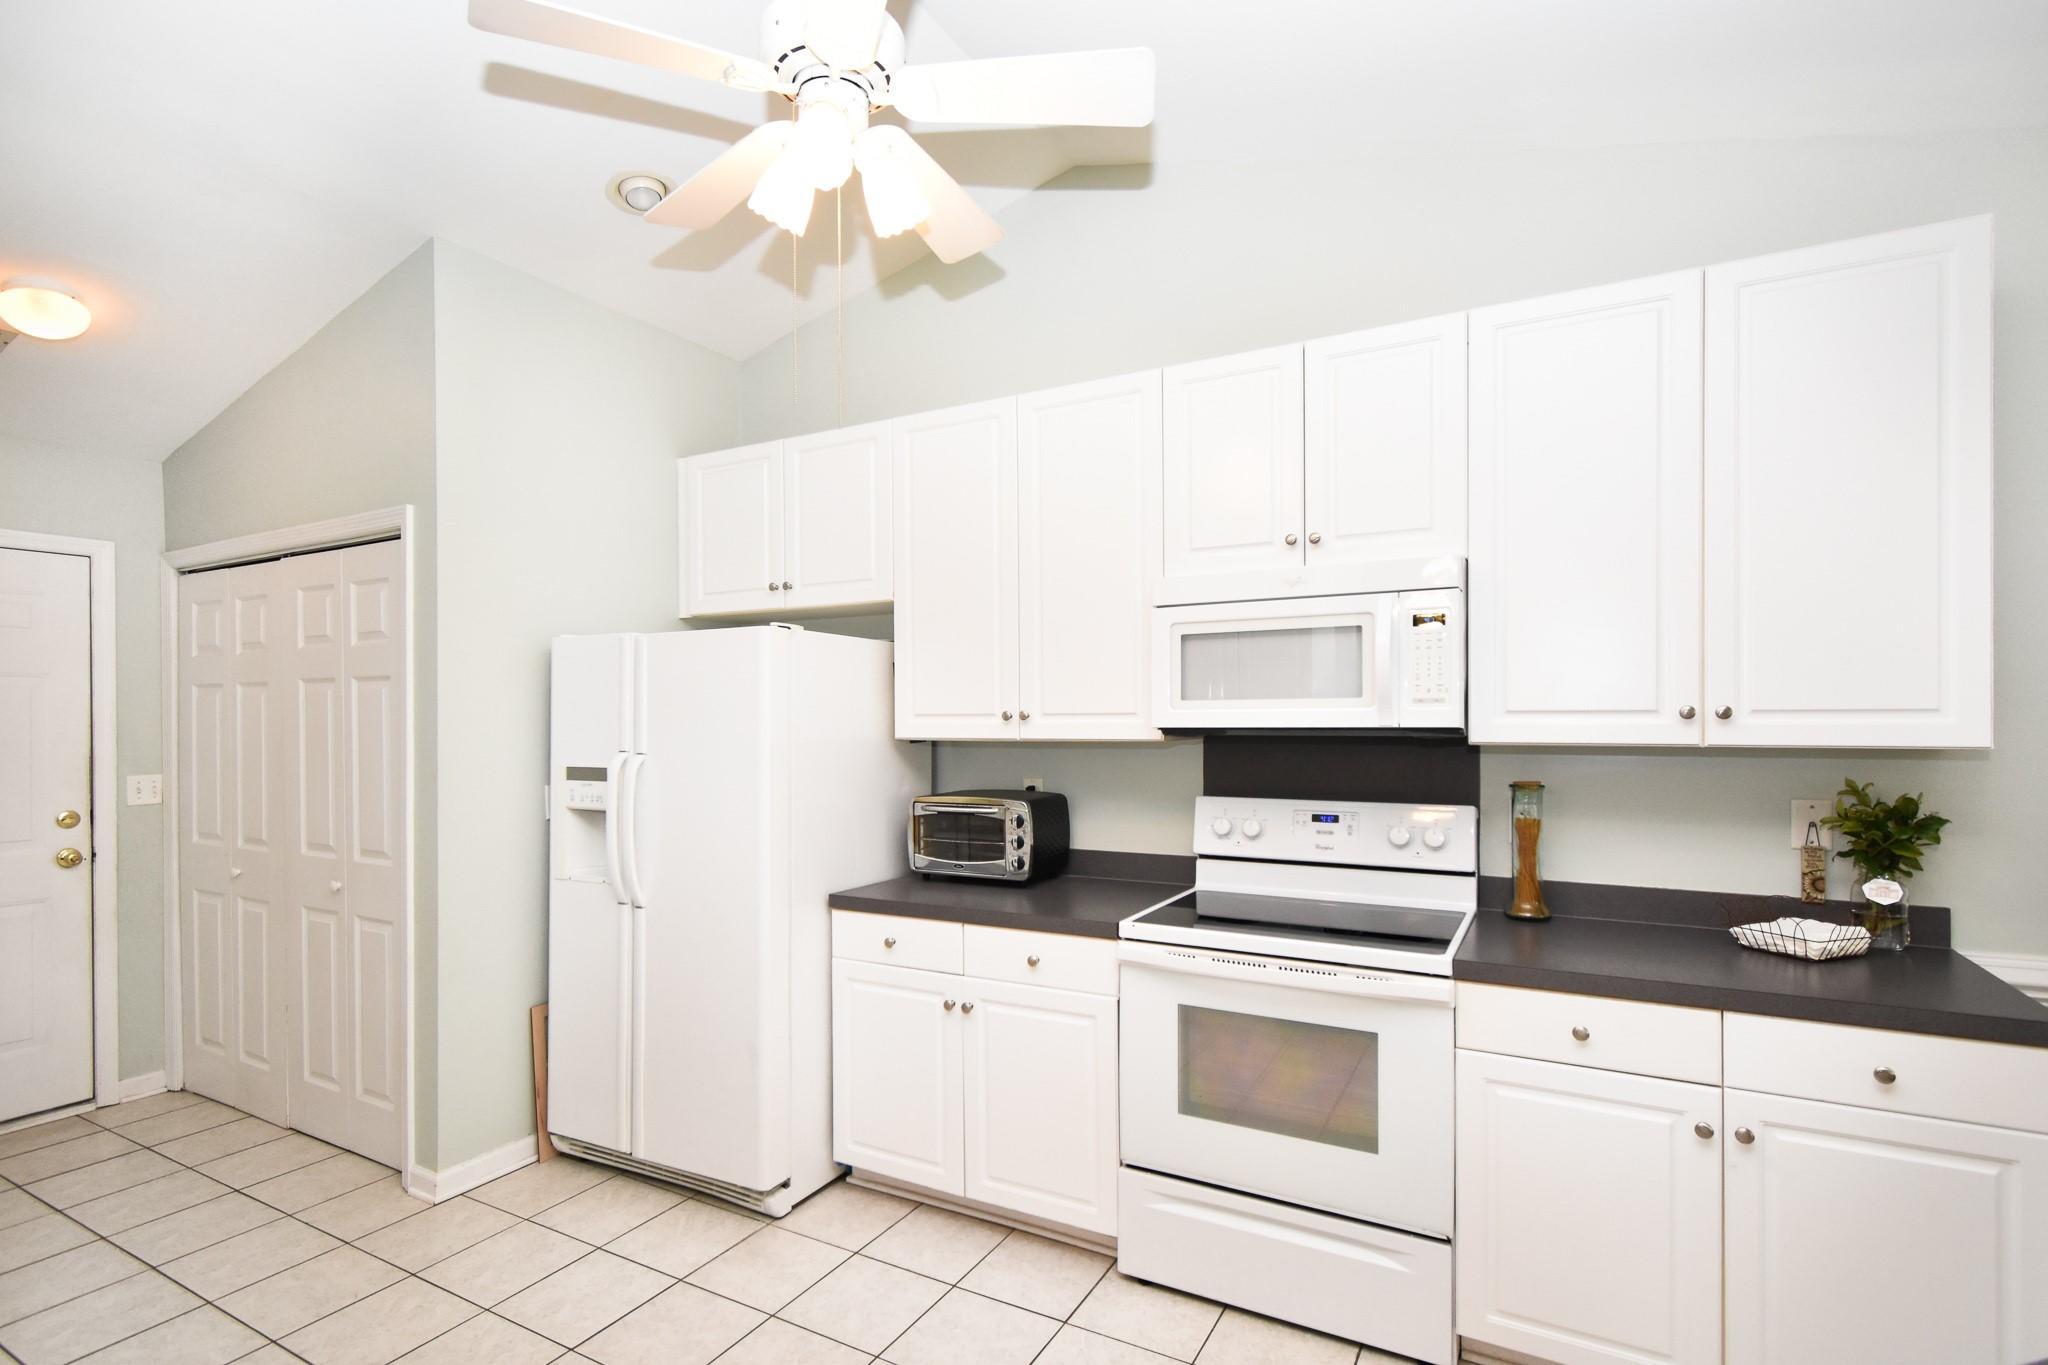 Park West Homes For Sale - 1444 Wellesley, Mount Pleasant, SC - 24